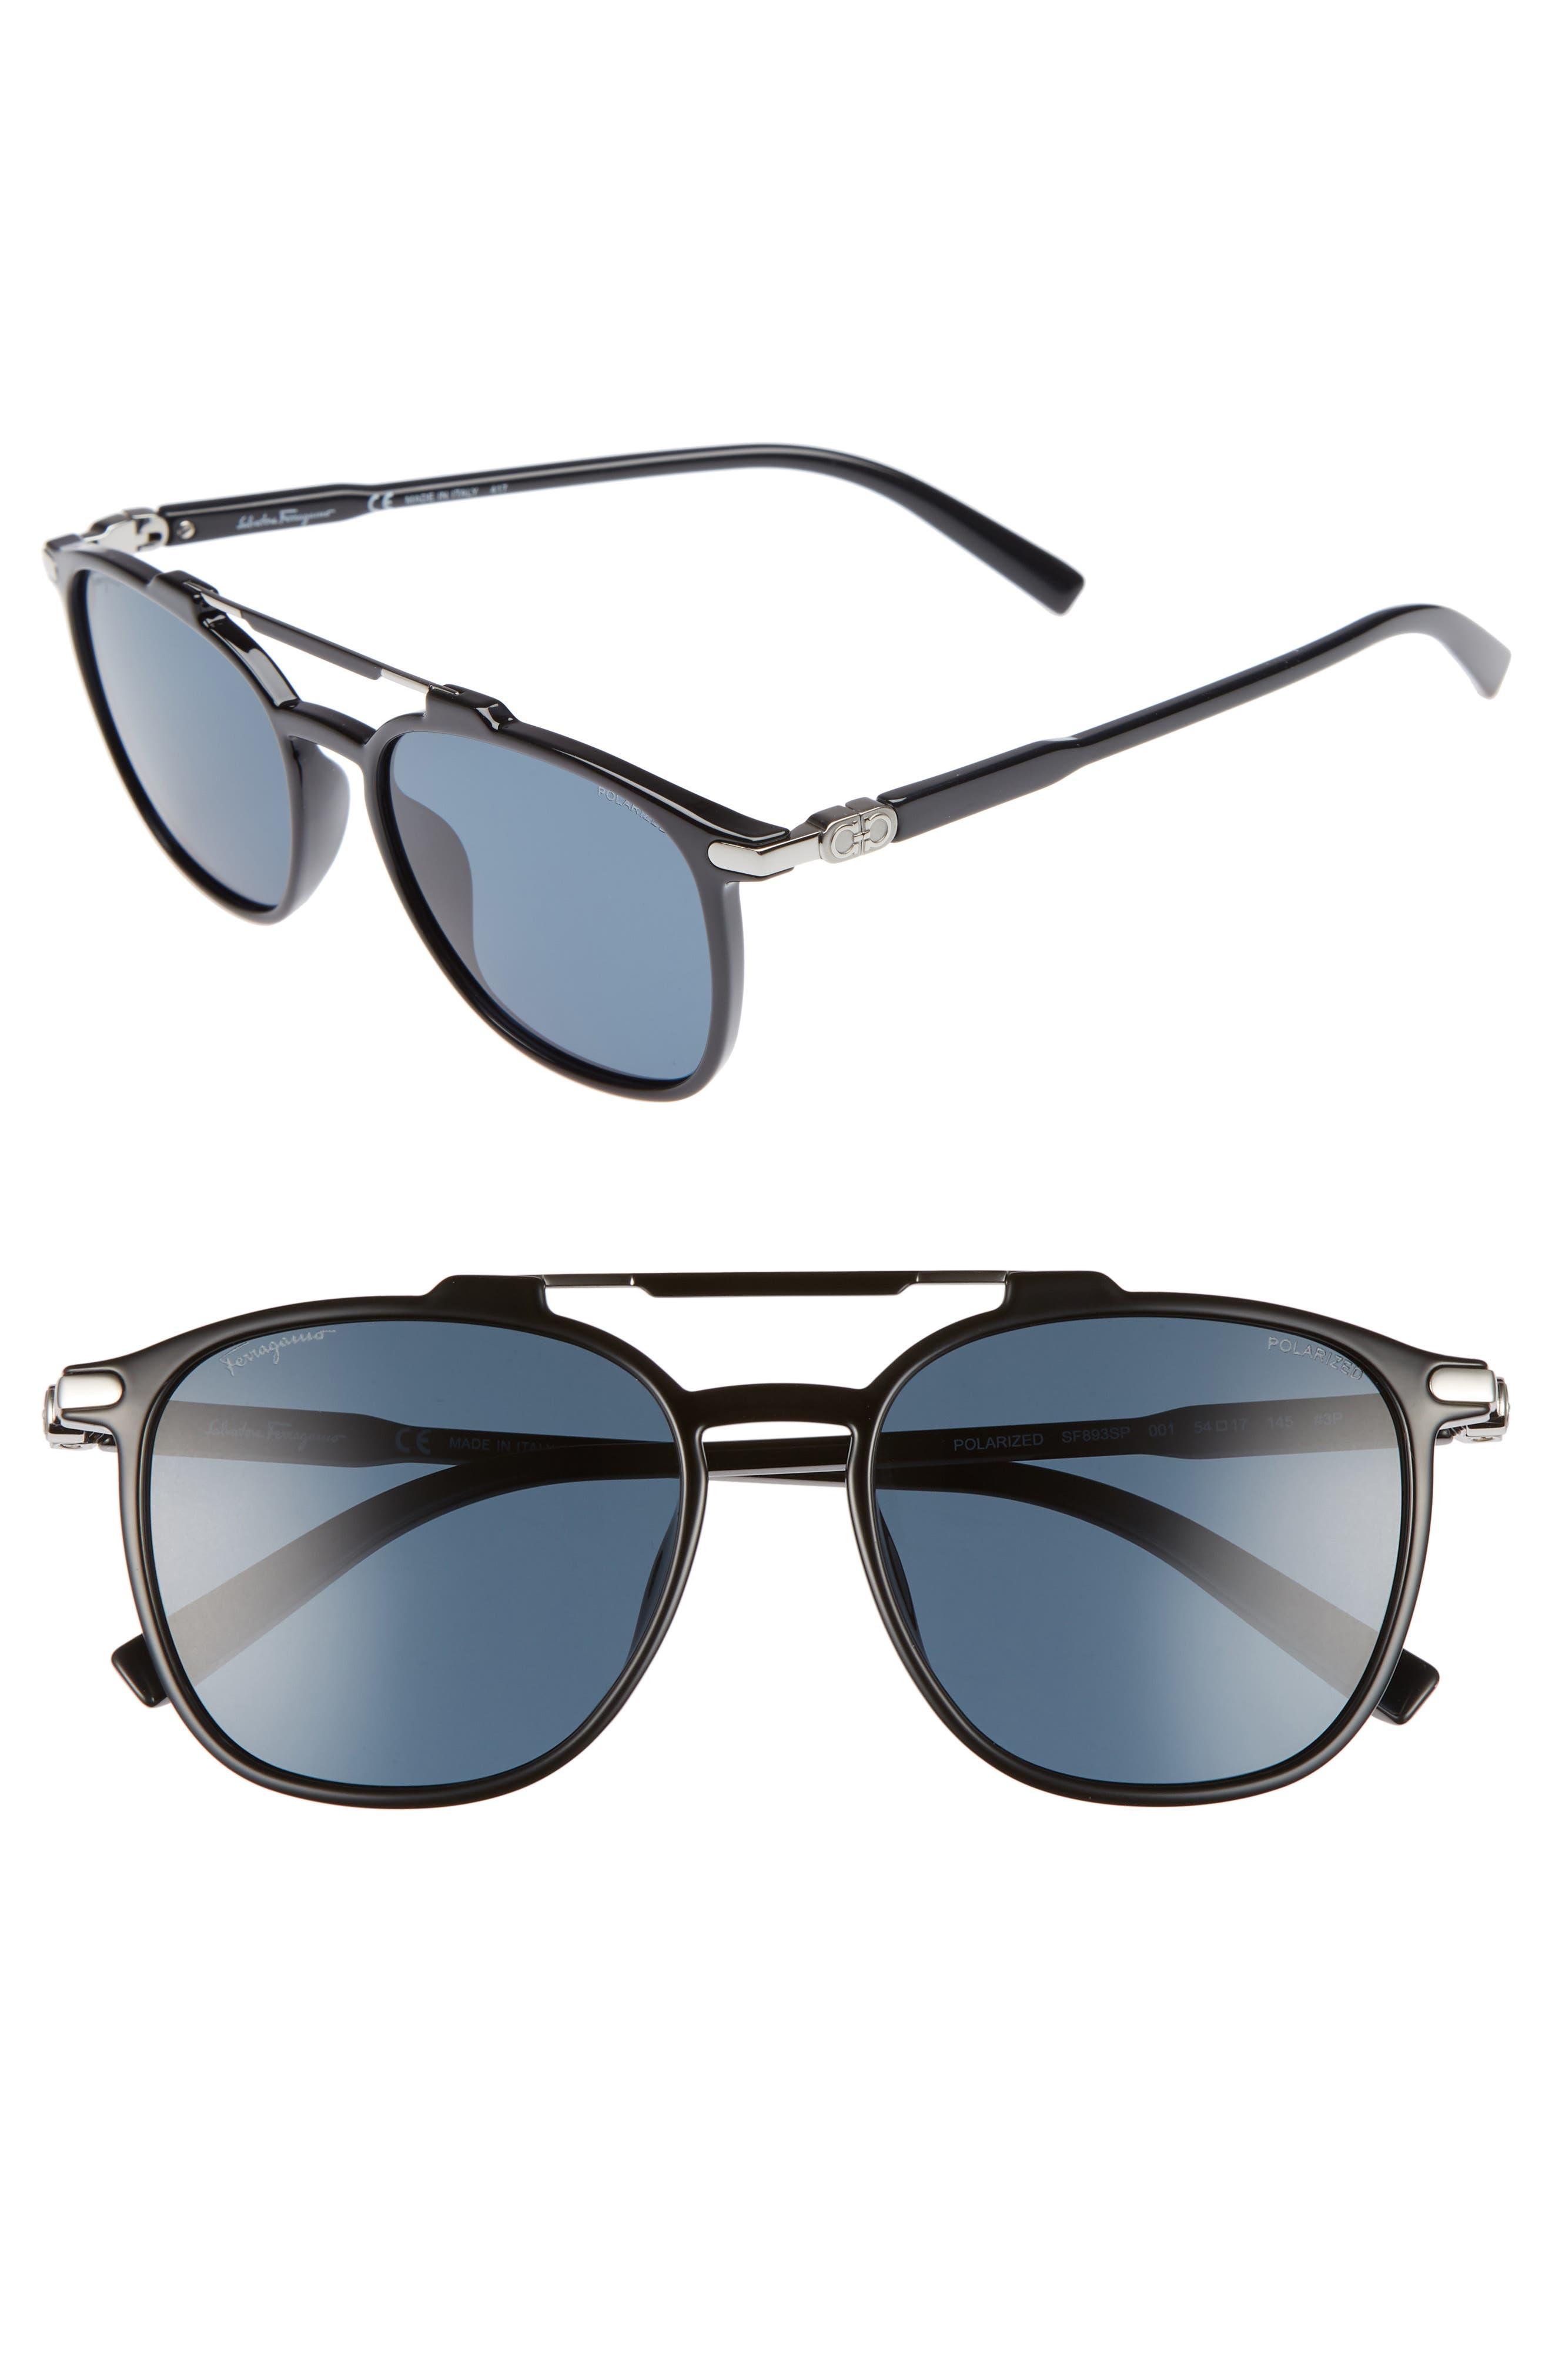 Double Gancio 54mm Polarized Sunglasses,                             Main thumbnail 1, color,                             BLACK